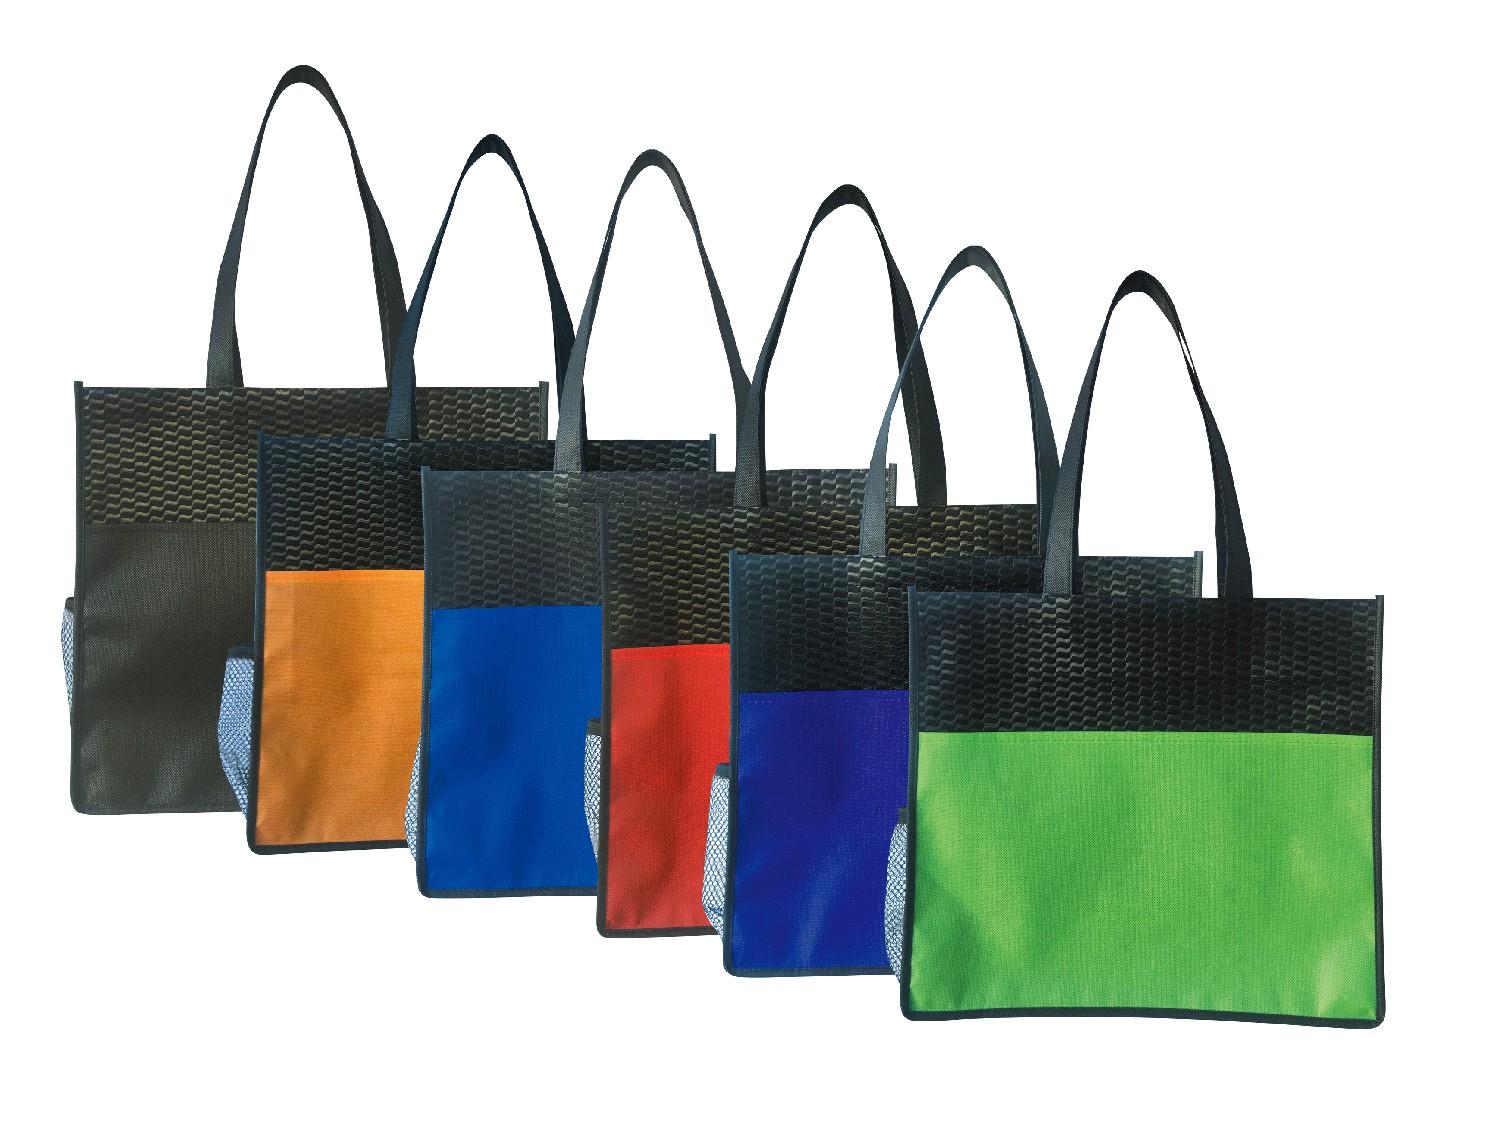 Wholesale Eco friendly custom cheap non woven bag with logo printed, Eco friendly custom cheap non woven bag with logo printed Manufacturers, Eco friendly custom cheap non woven bag with logo printed Producers